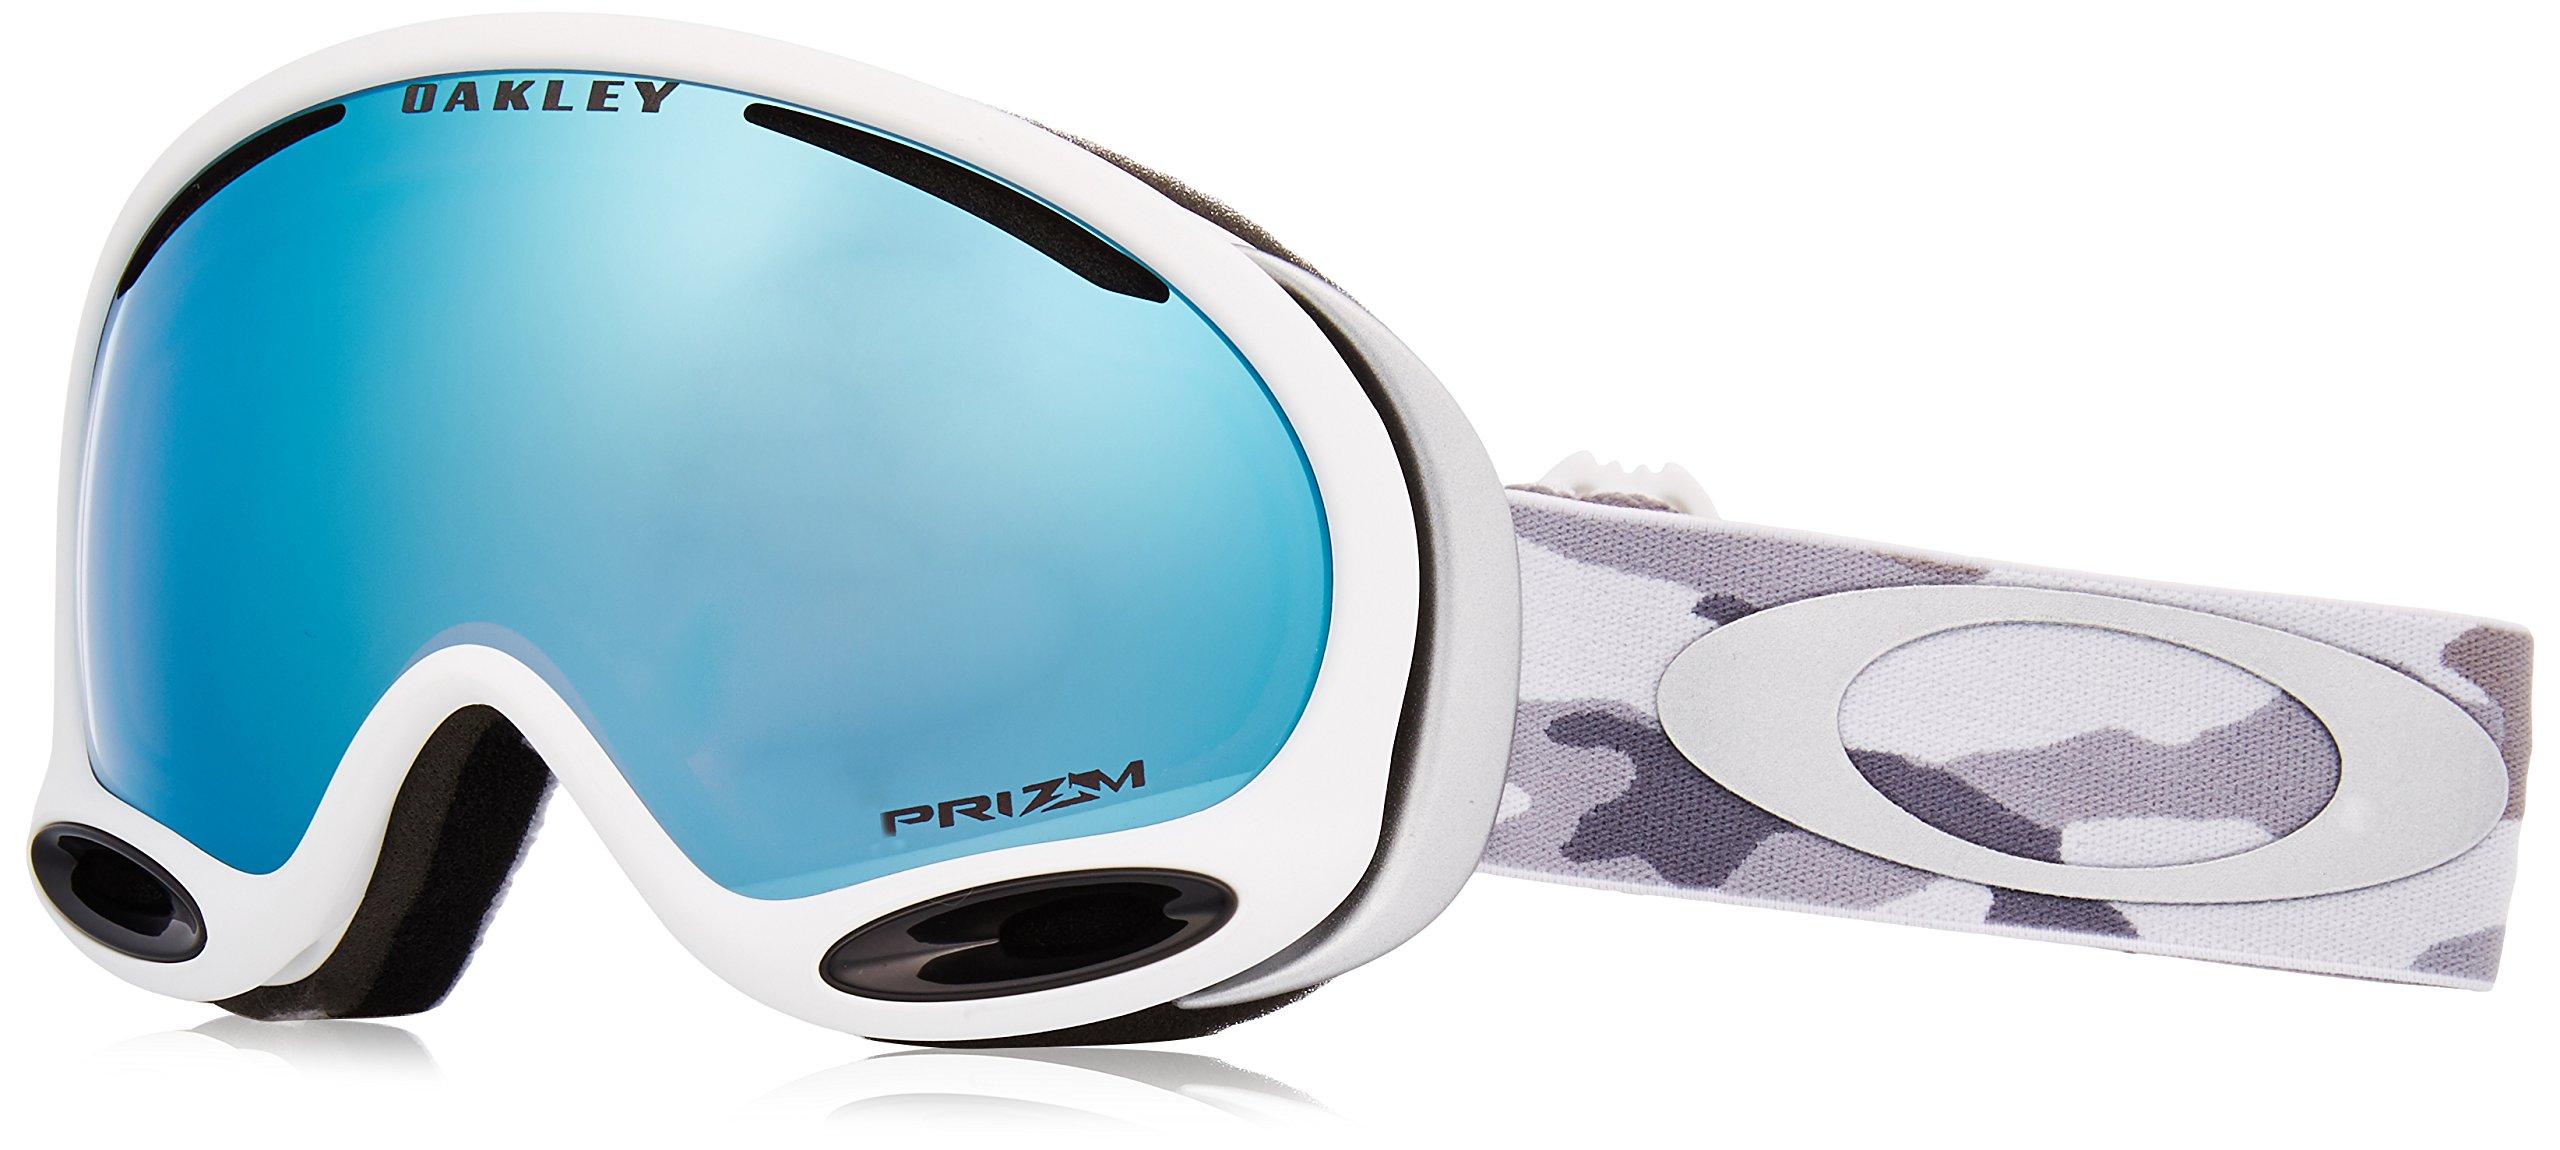 Oakley A-Frame 2.0 Masque de Ski Mixte product image